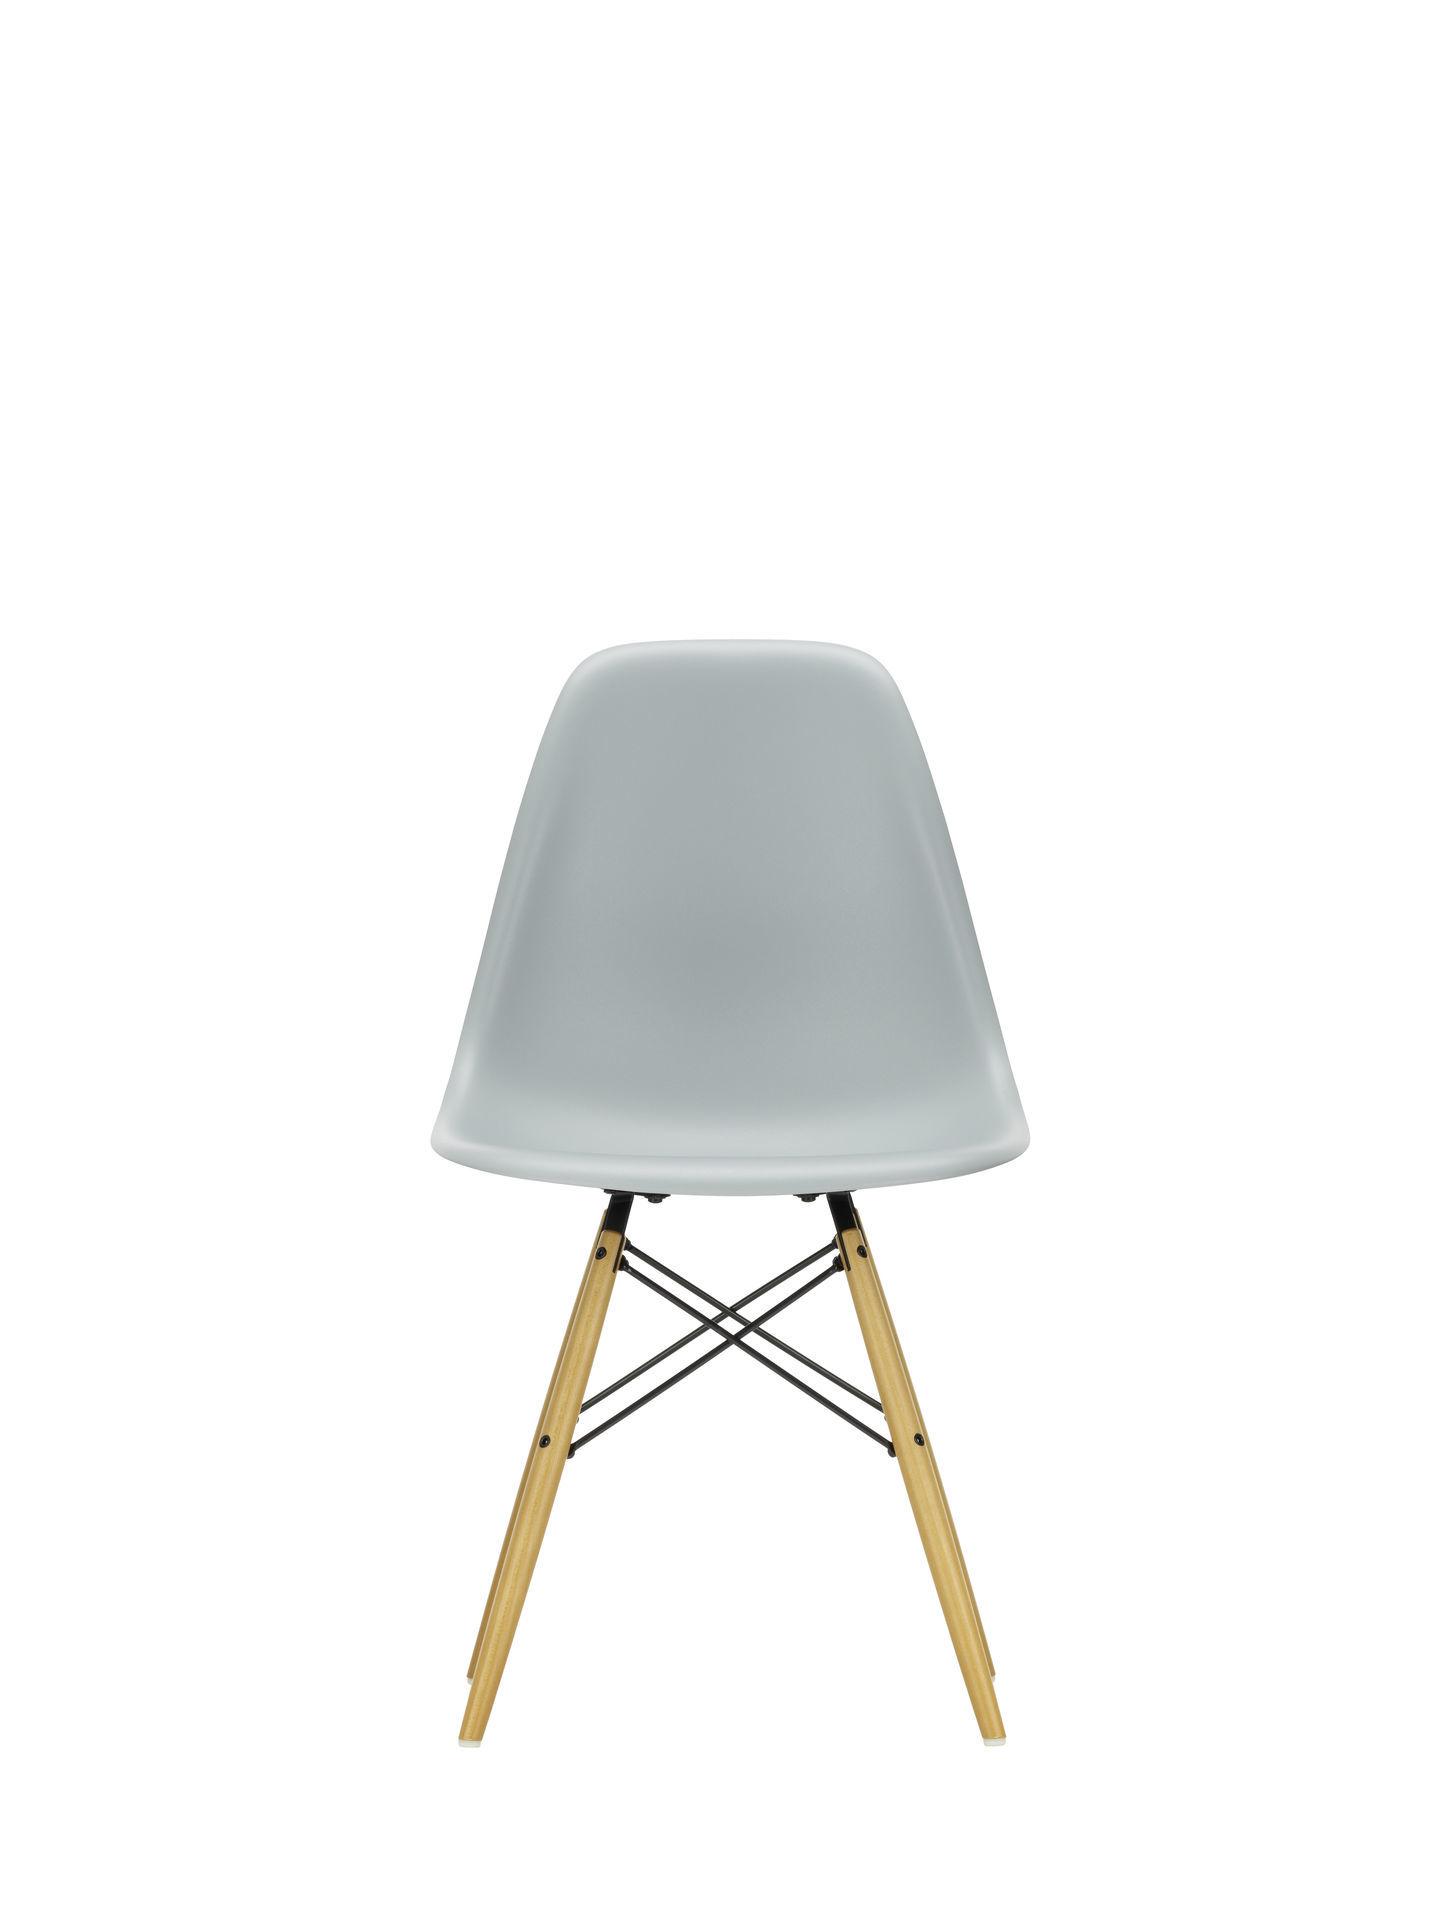 Eames Plastic Side Chair DSW Vitra Ahorn gelblich-Grün